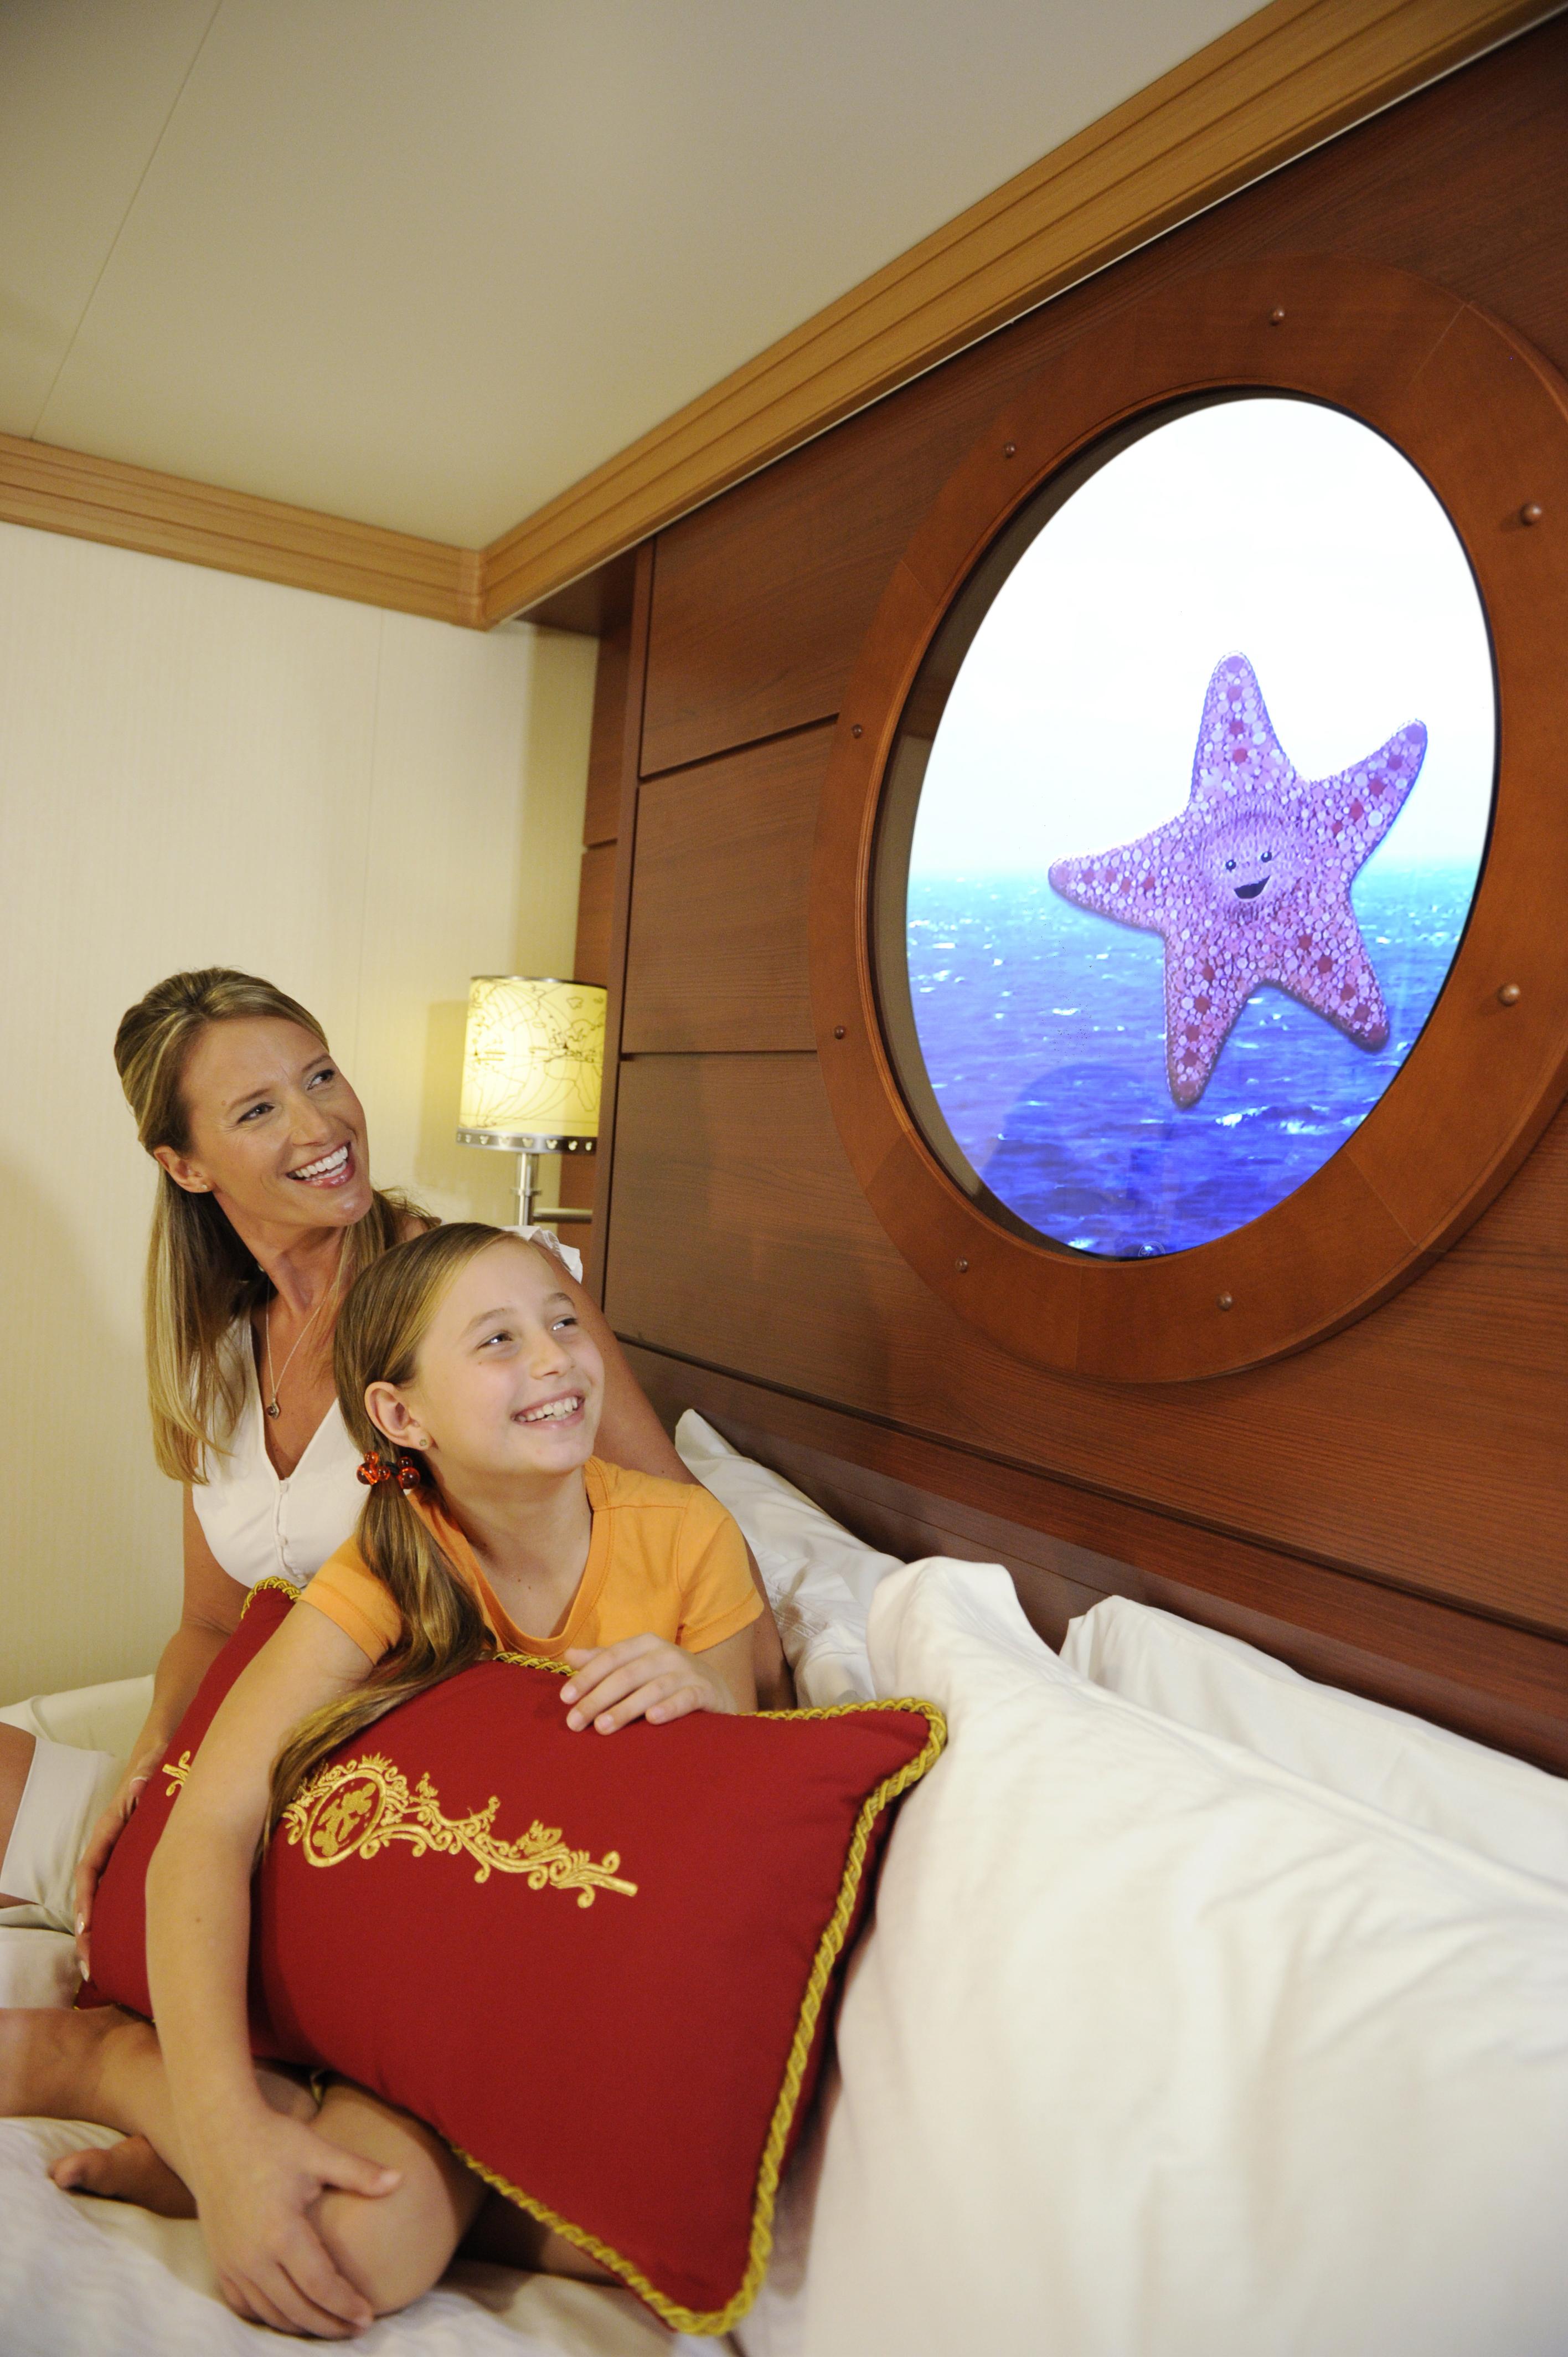 Disney Cruise Line Disney Dream Accommodation Category 11 Standard Inside Stateroom.jpg